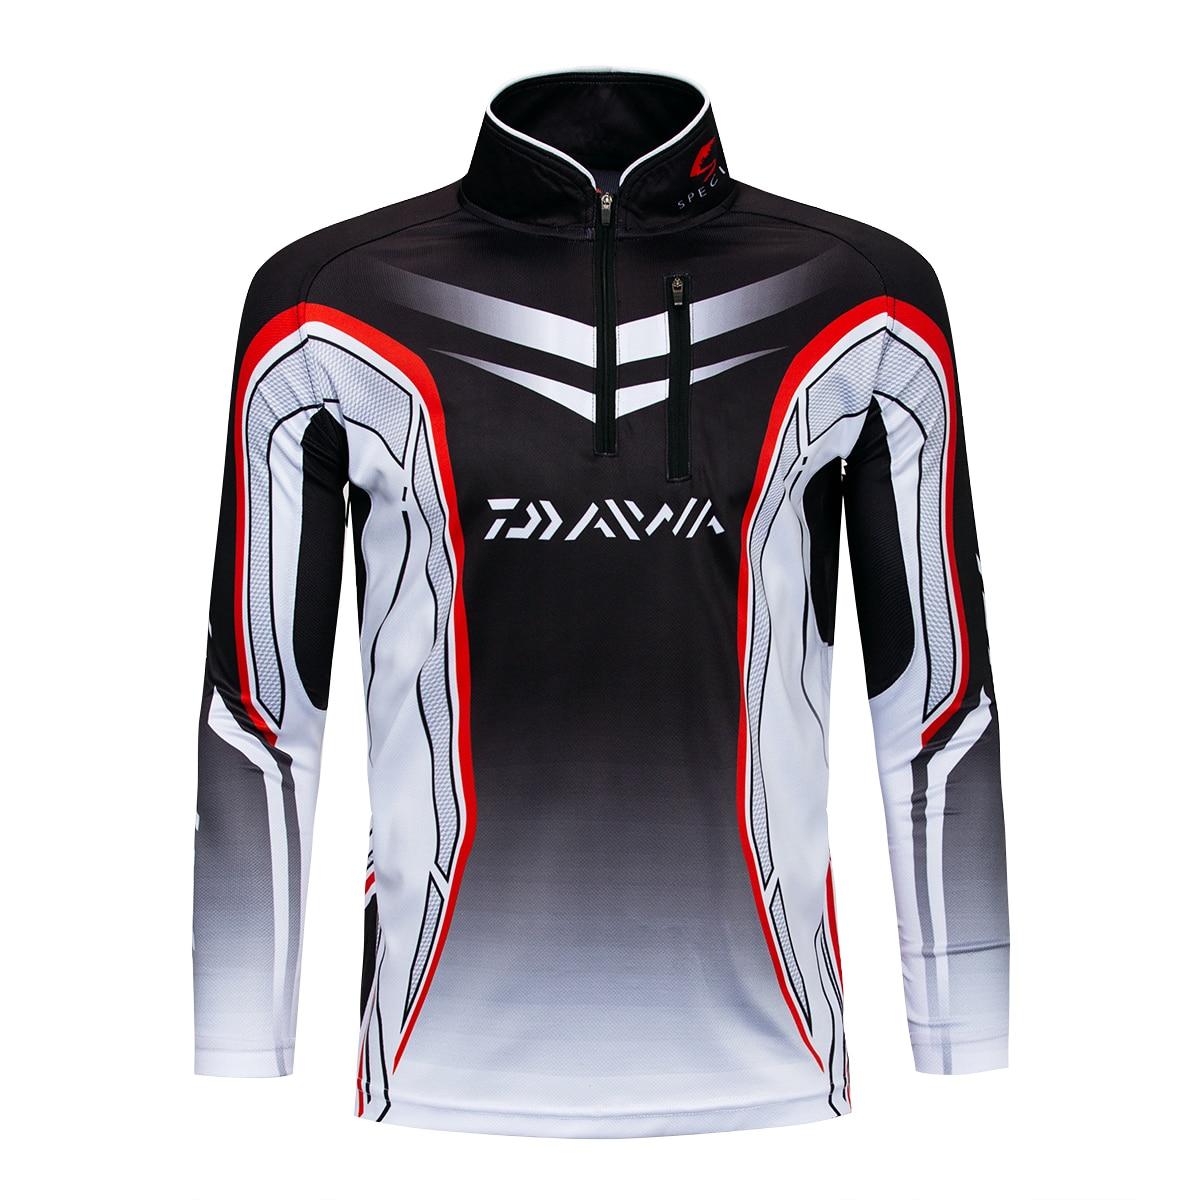 2018 New Pro Daiwa Fishing Clothing Quick-Drying Jersey Anti-UV Jacket Sports Clothes Long Sleeve